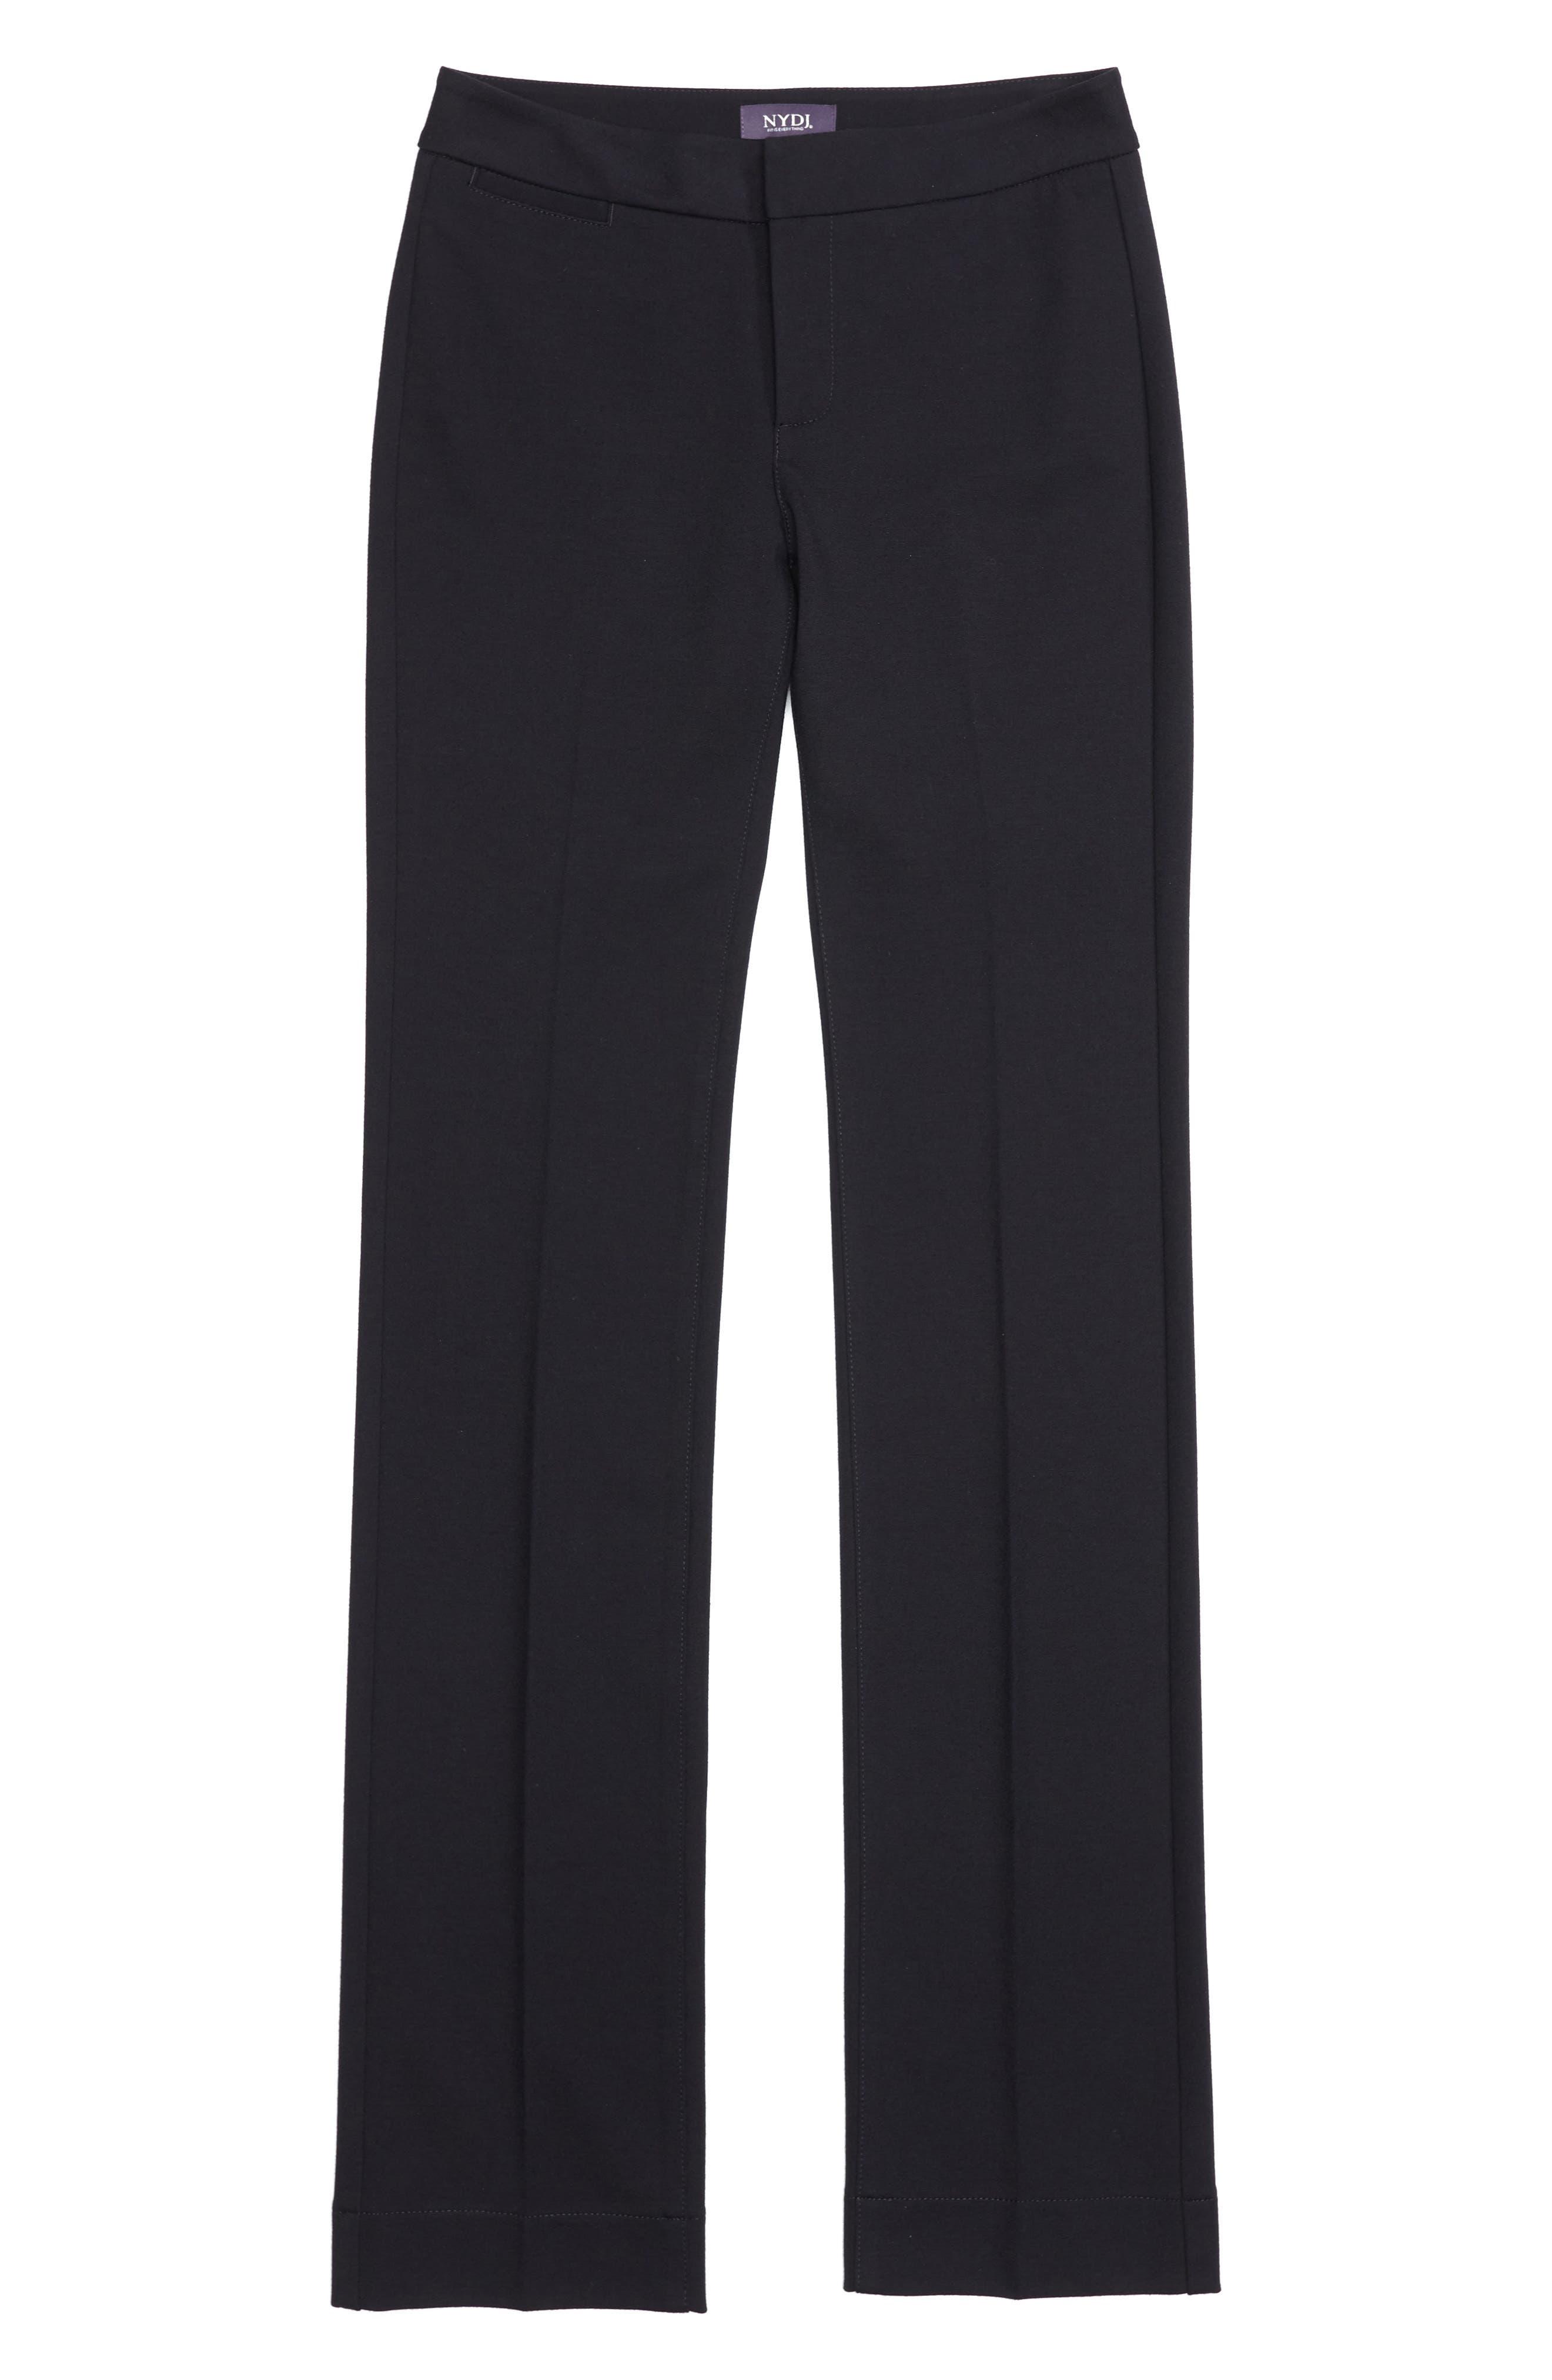 Stretch Knit Straight Leg Trousers,                             Alternate thumbnail 6, color,                             BLACK